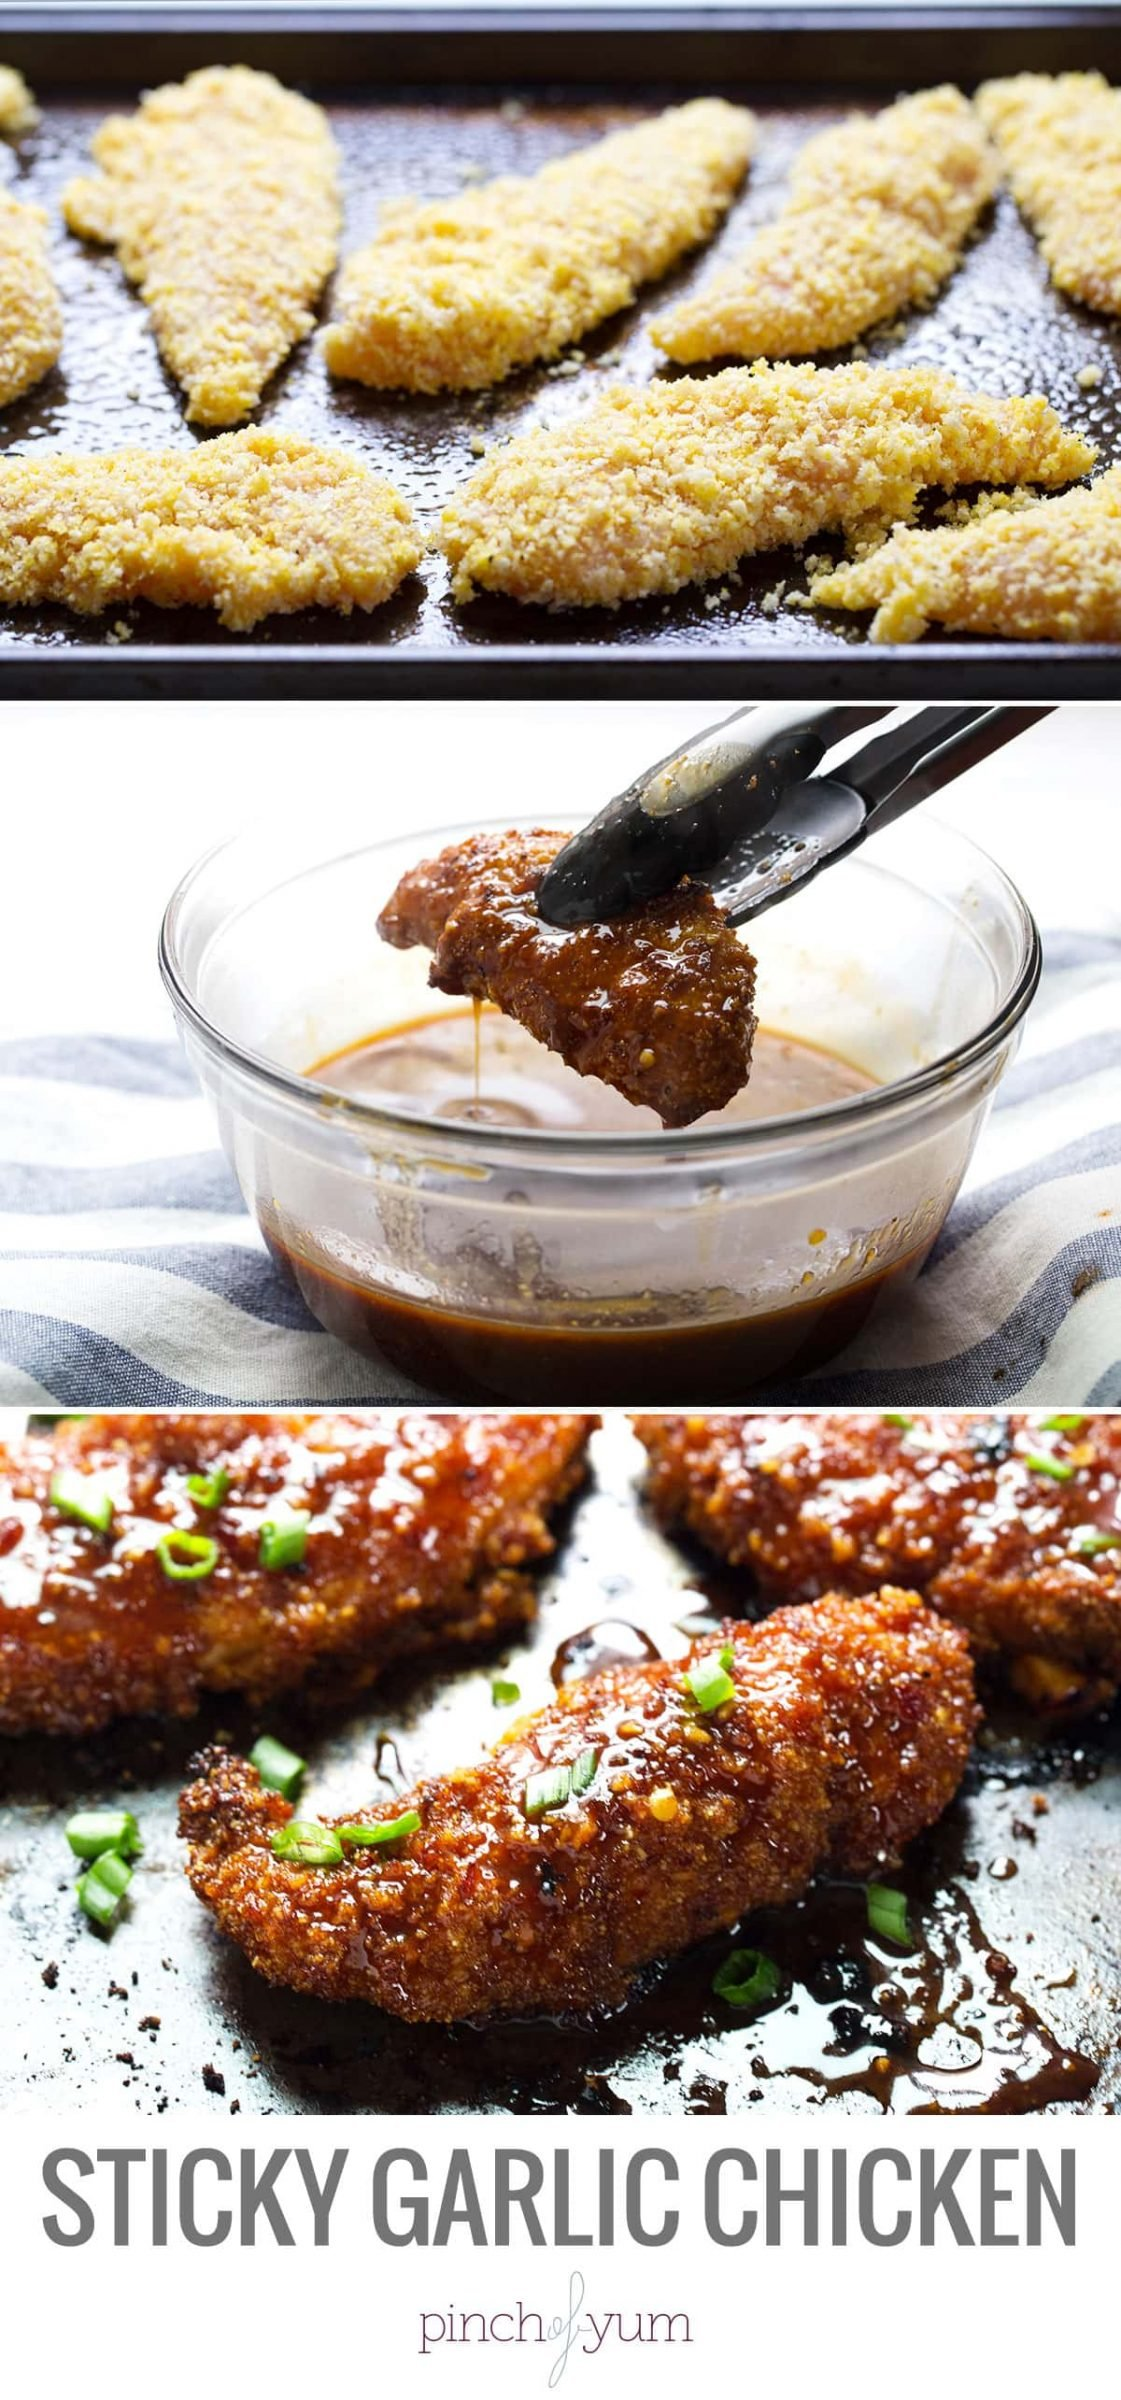 Sticky Garlic Chicken and Broccoli - bake, dip, bake again, eat and love. 340 calories. | pinchofyum.com #chicken #recipe